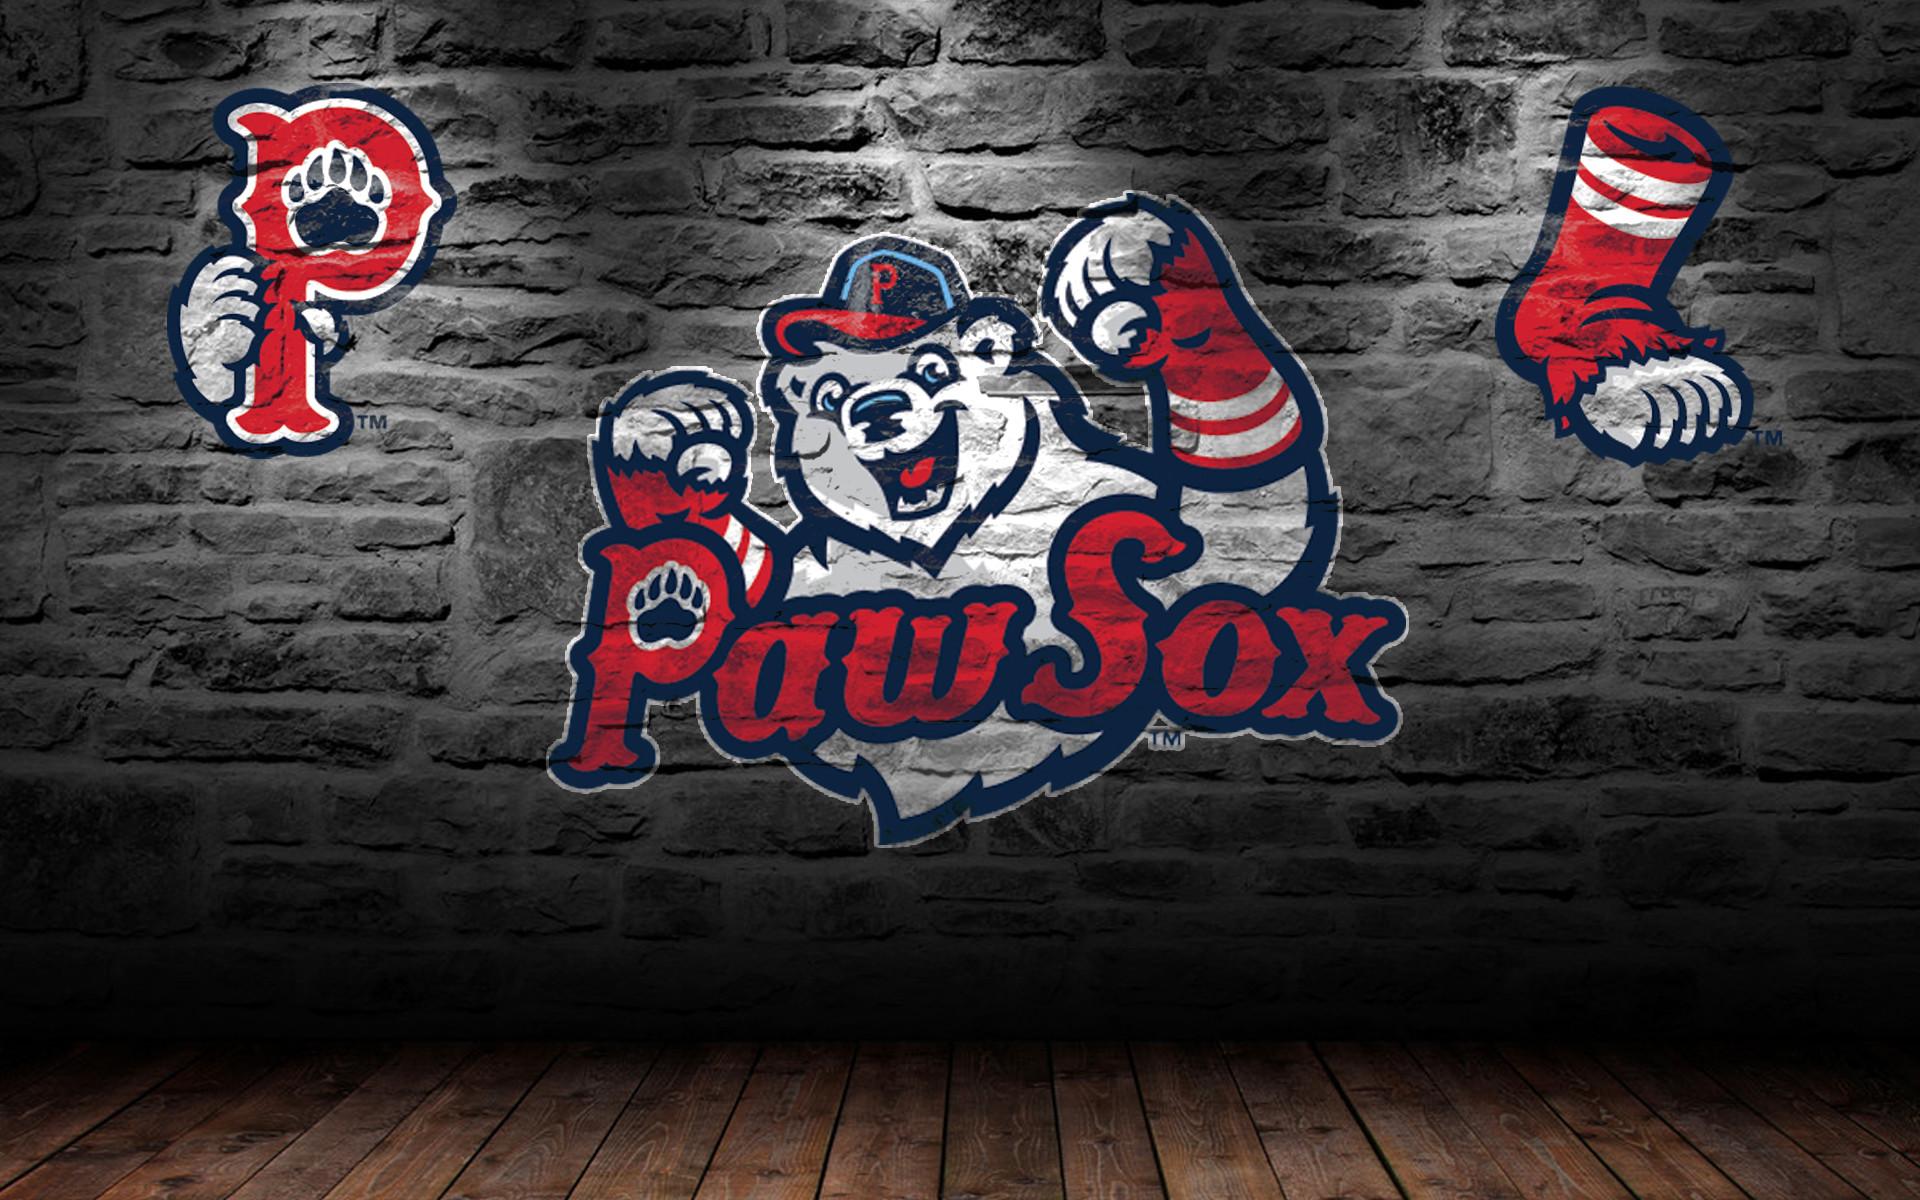 PawSox Wallpaper